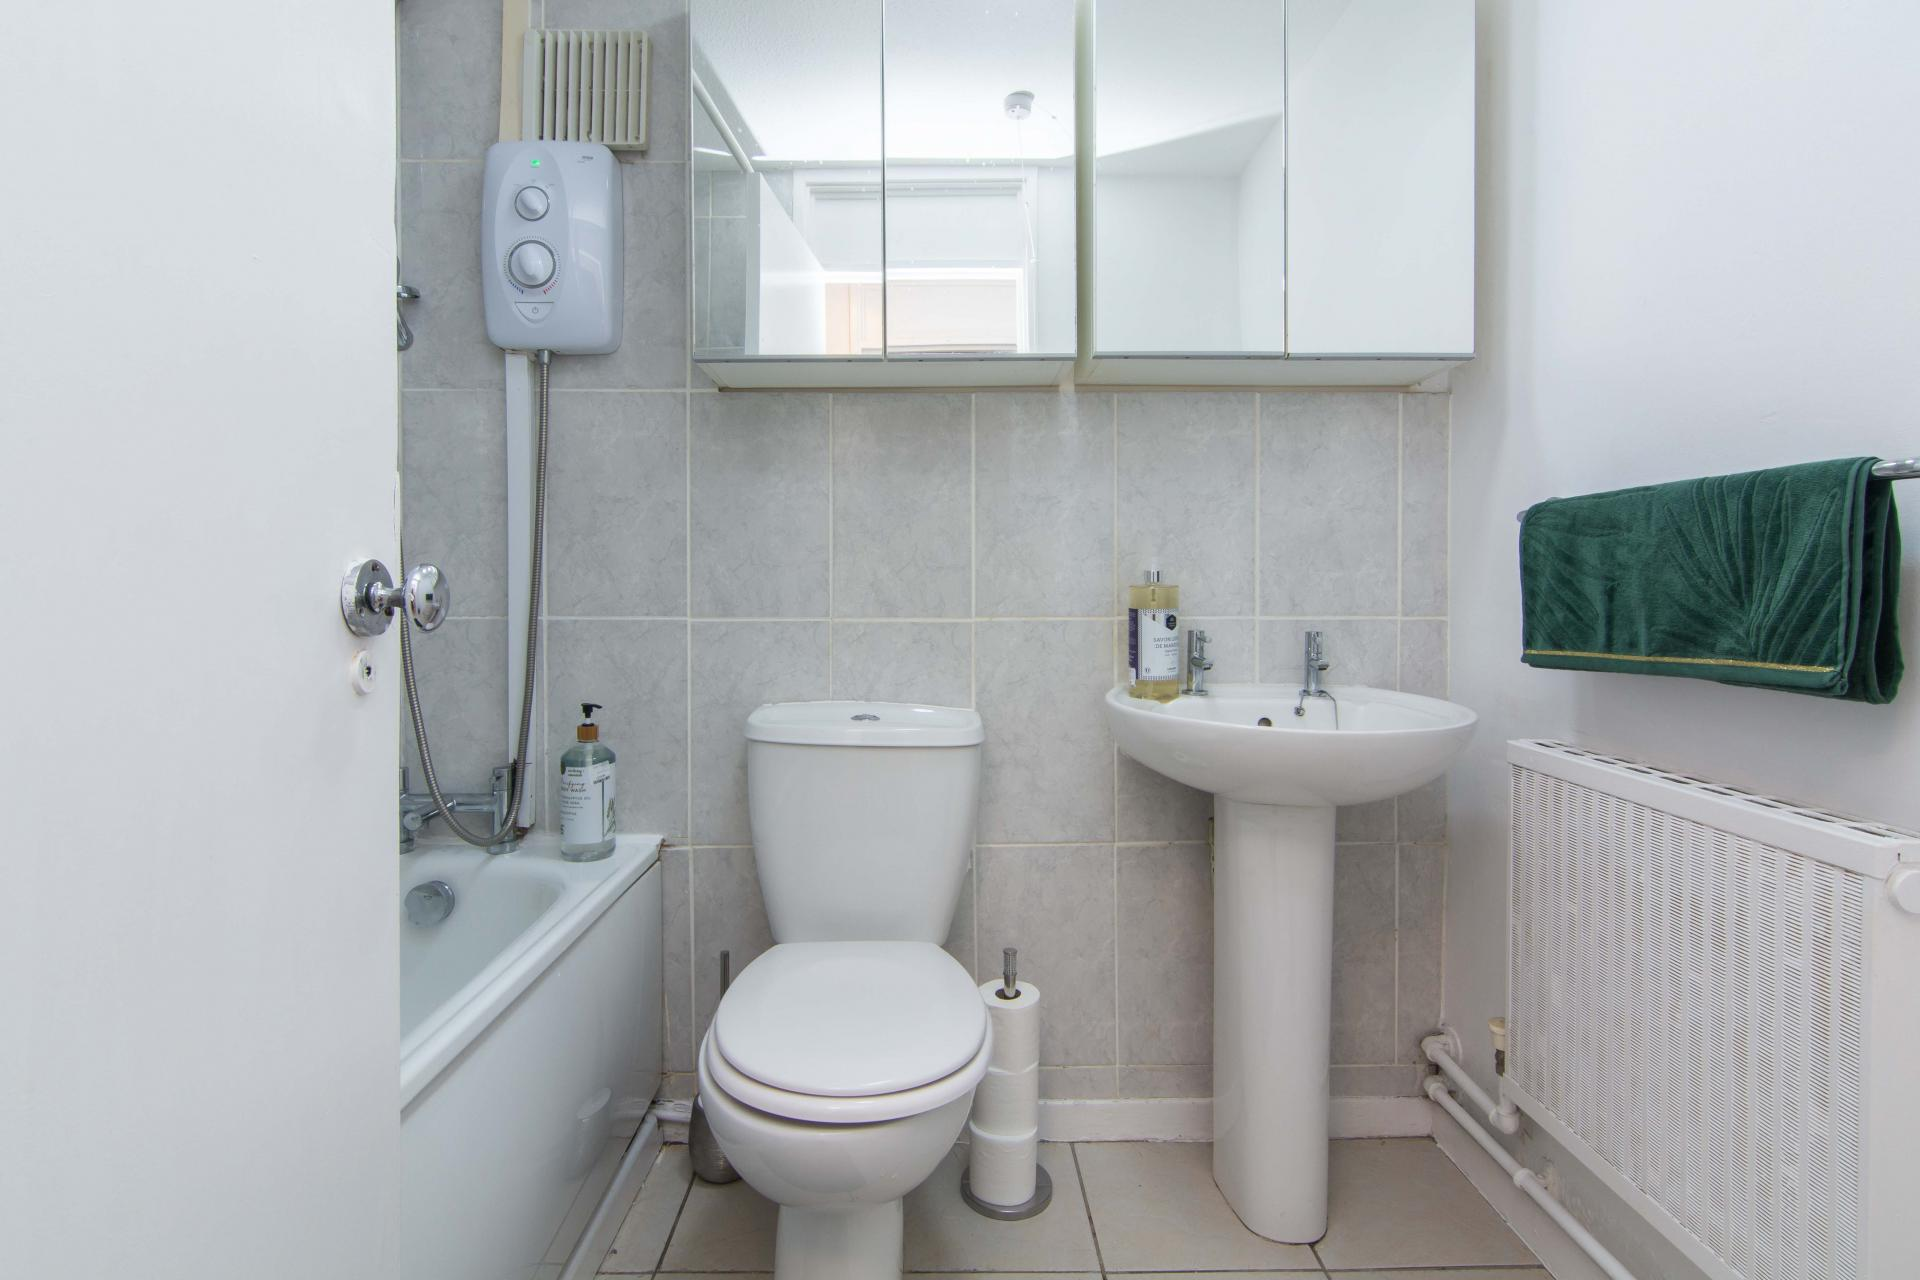 Bathroom at Victoria Centre Apartment, Centre, Nottingham - Citybase Apartments